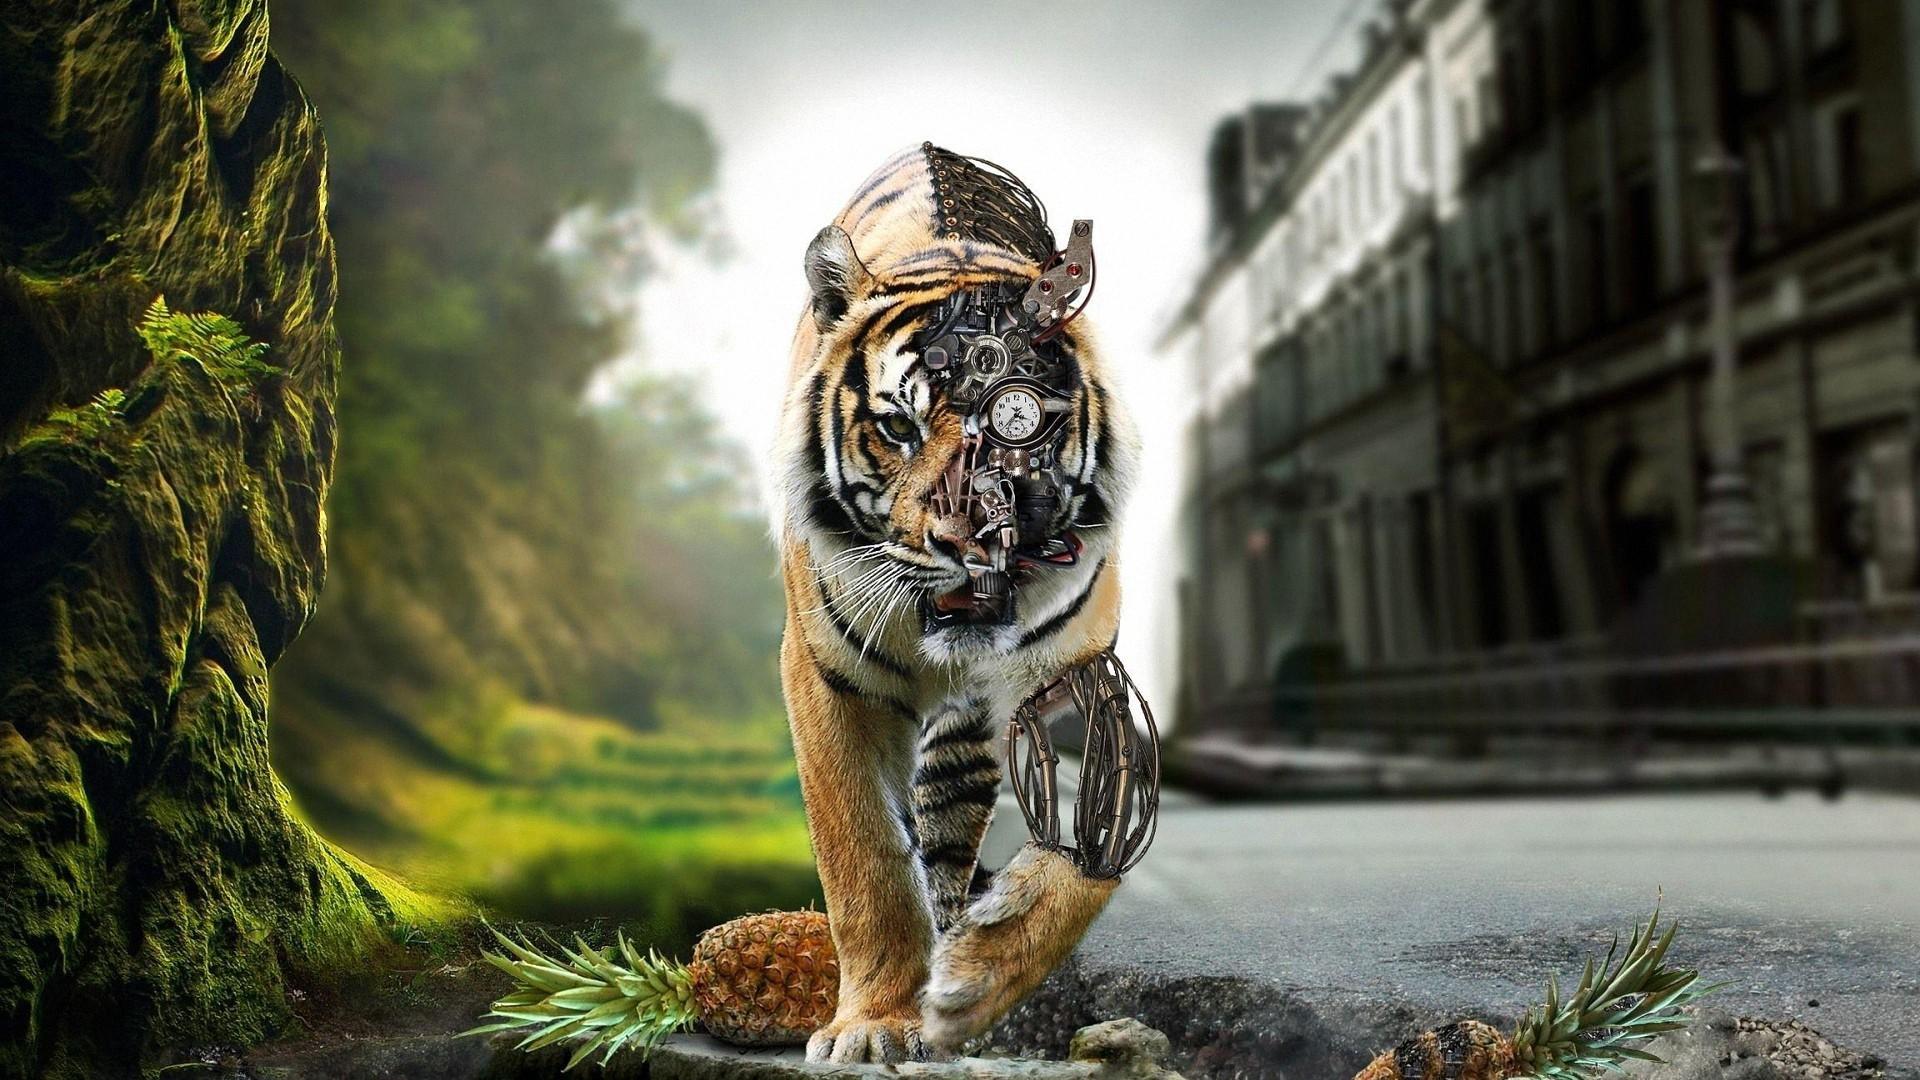 … full hd desktop wallpaper 1920×1080; tiger hd wallpapers on  wallpaperget com …